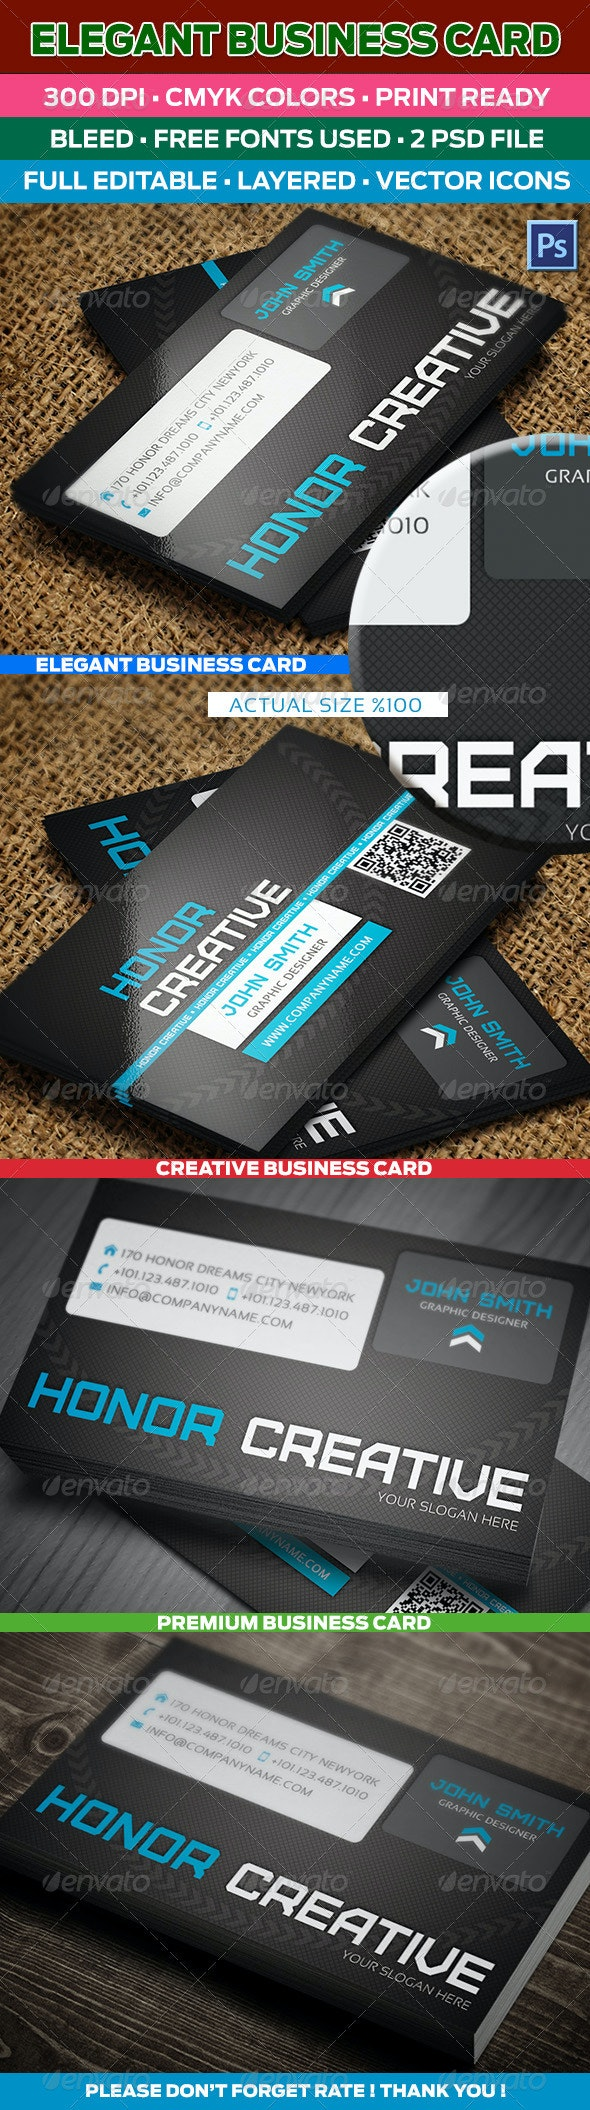 Creative Business Card 71 - Creative Business Cards